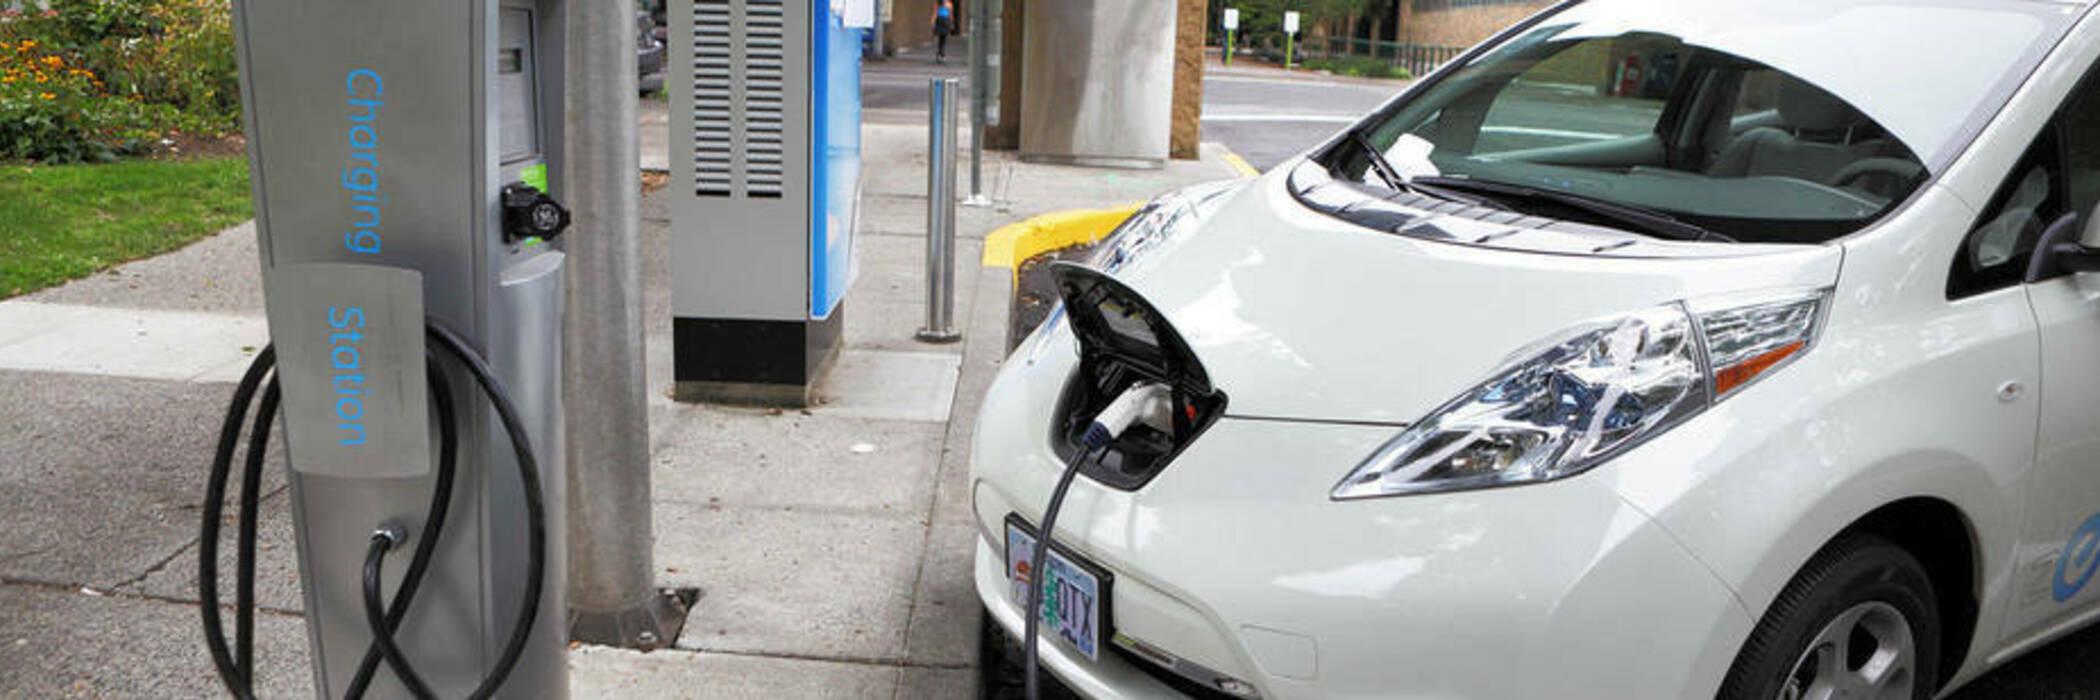 White Nissan Leaf charging